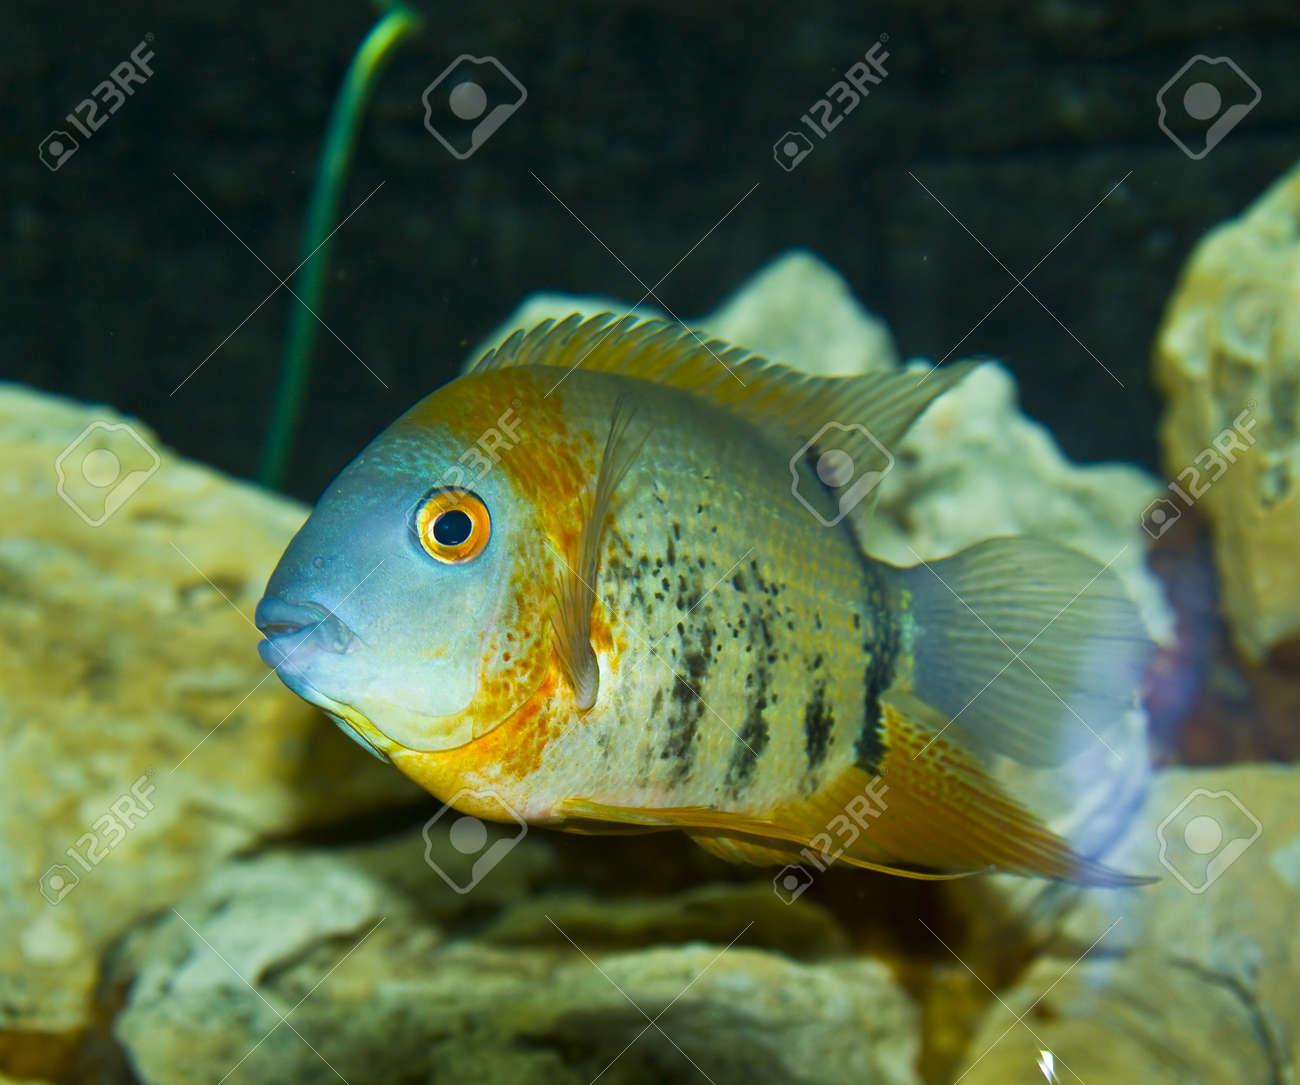 Fish for amazon aquarium - Stock Photo Tropical Fish Uaru Amphiacanthoides Cichlidae Lives In Latin America In River Amazon River Recorded In Aquarium